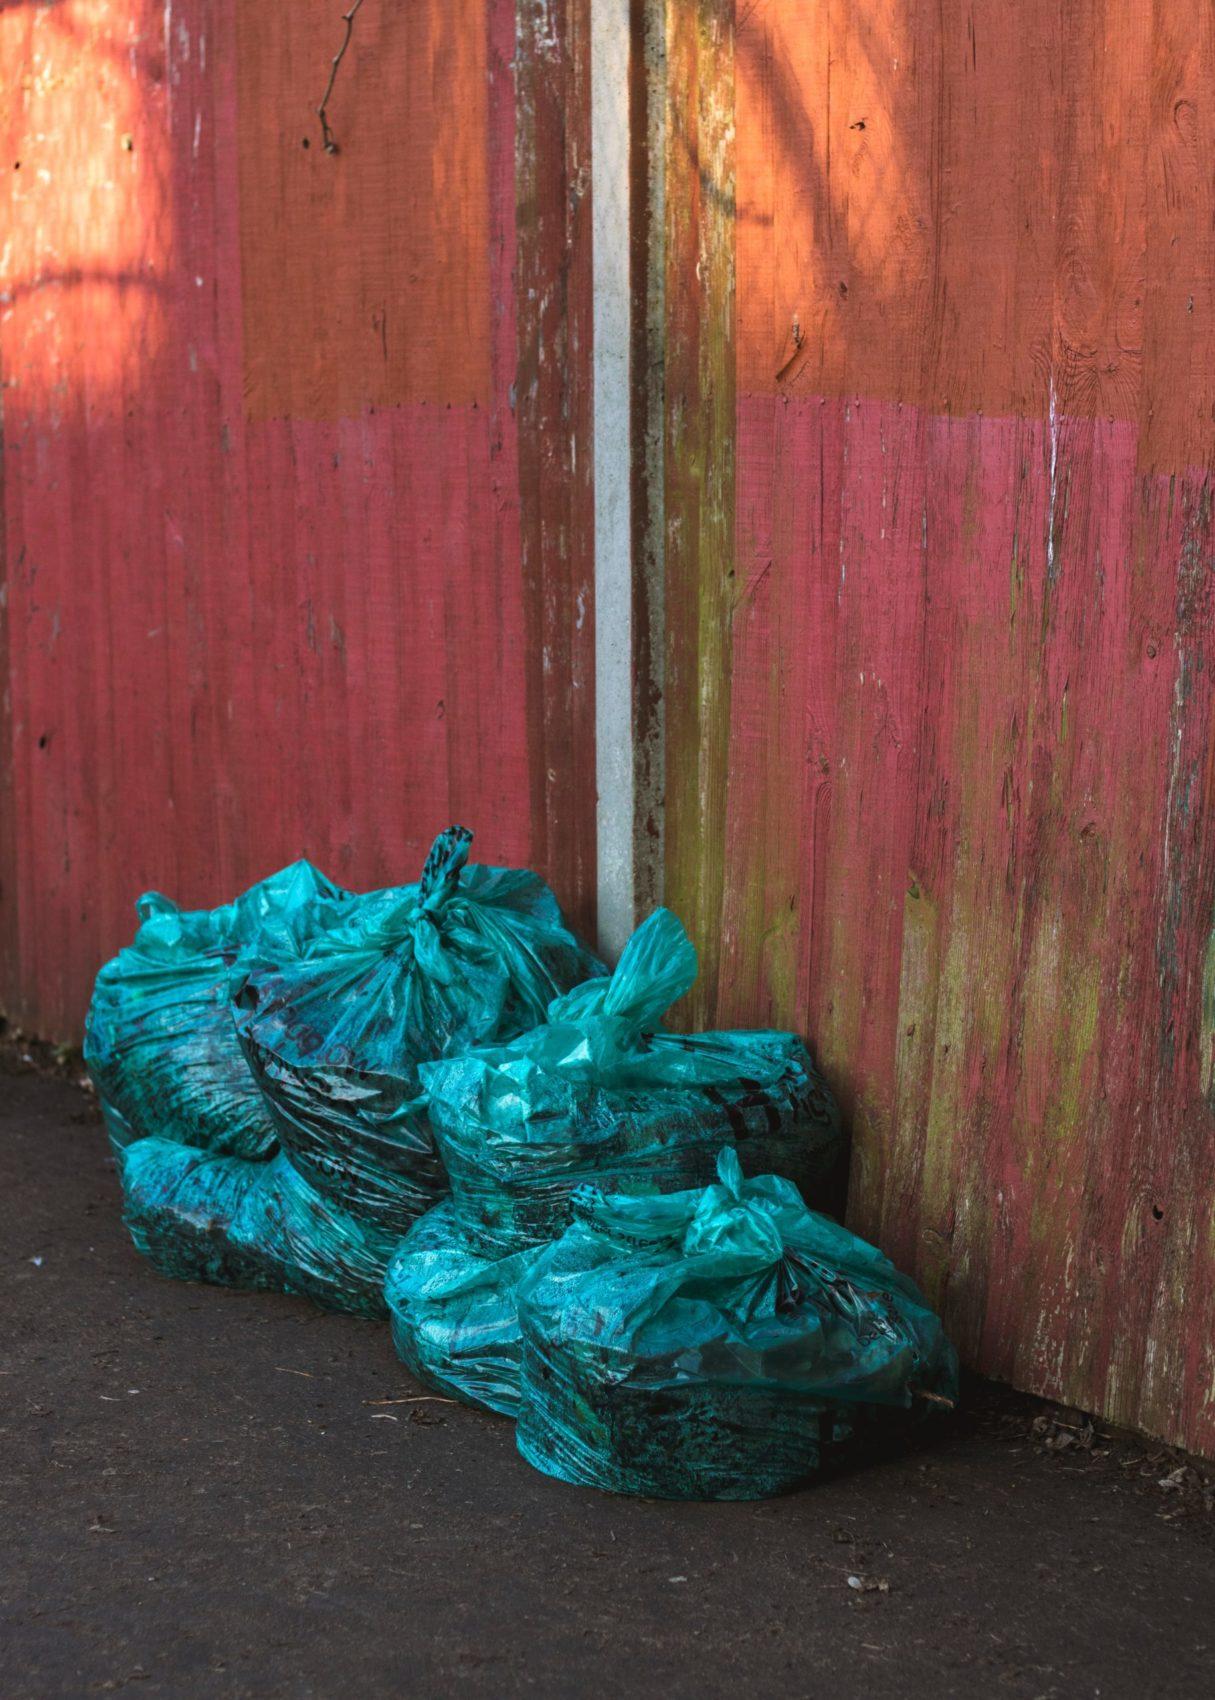 China banning single-use plastics